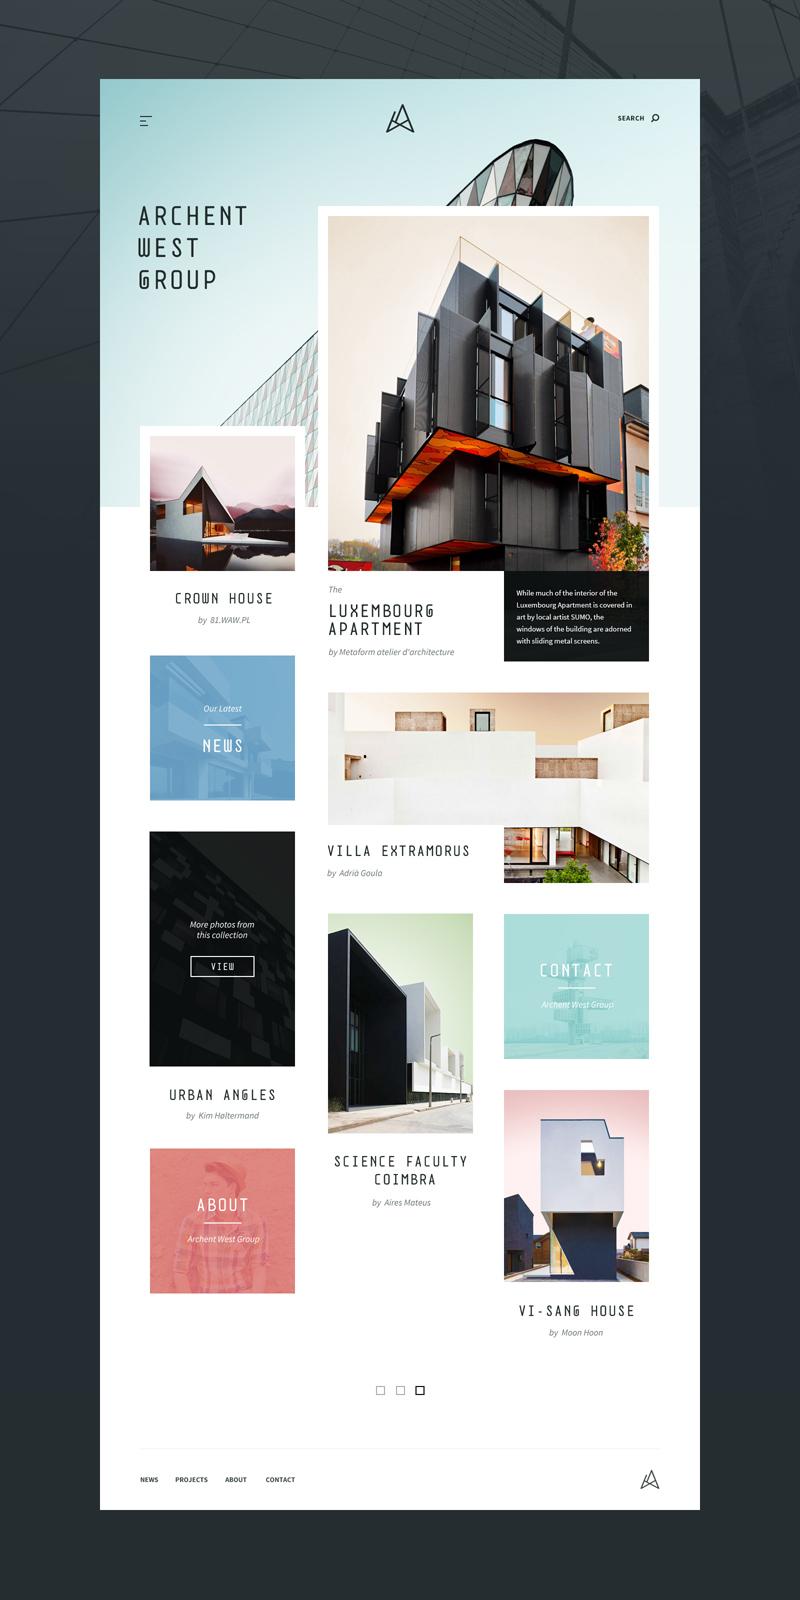 Architecture Website Template Concept - Adobe XD - Freebie